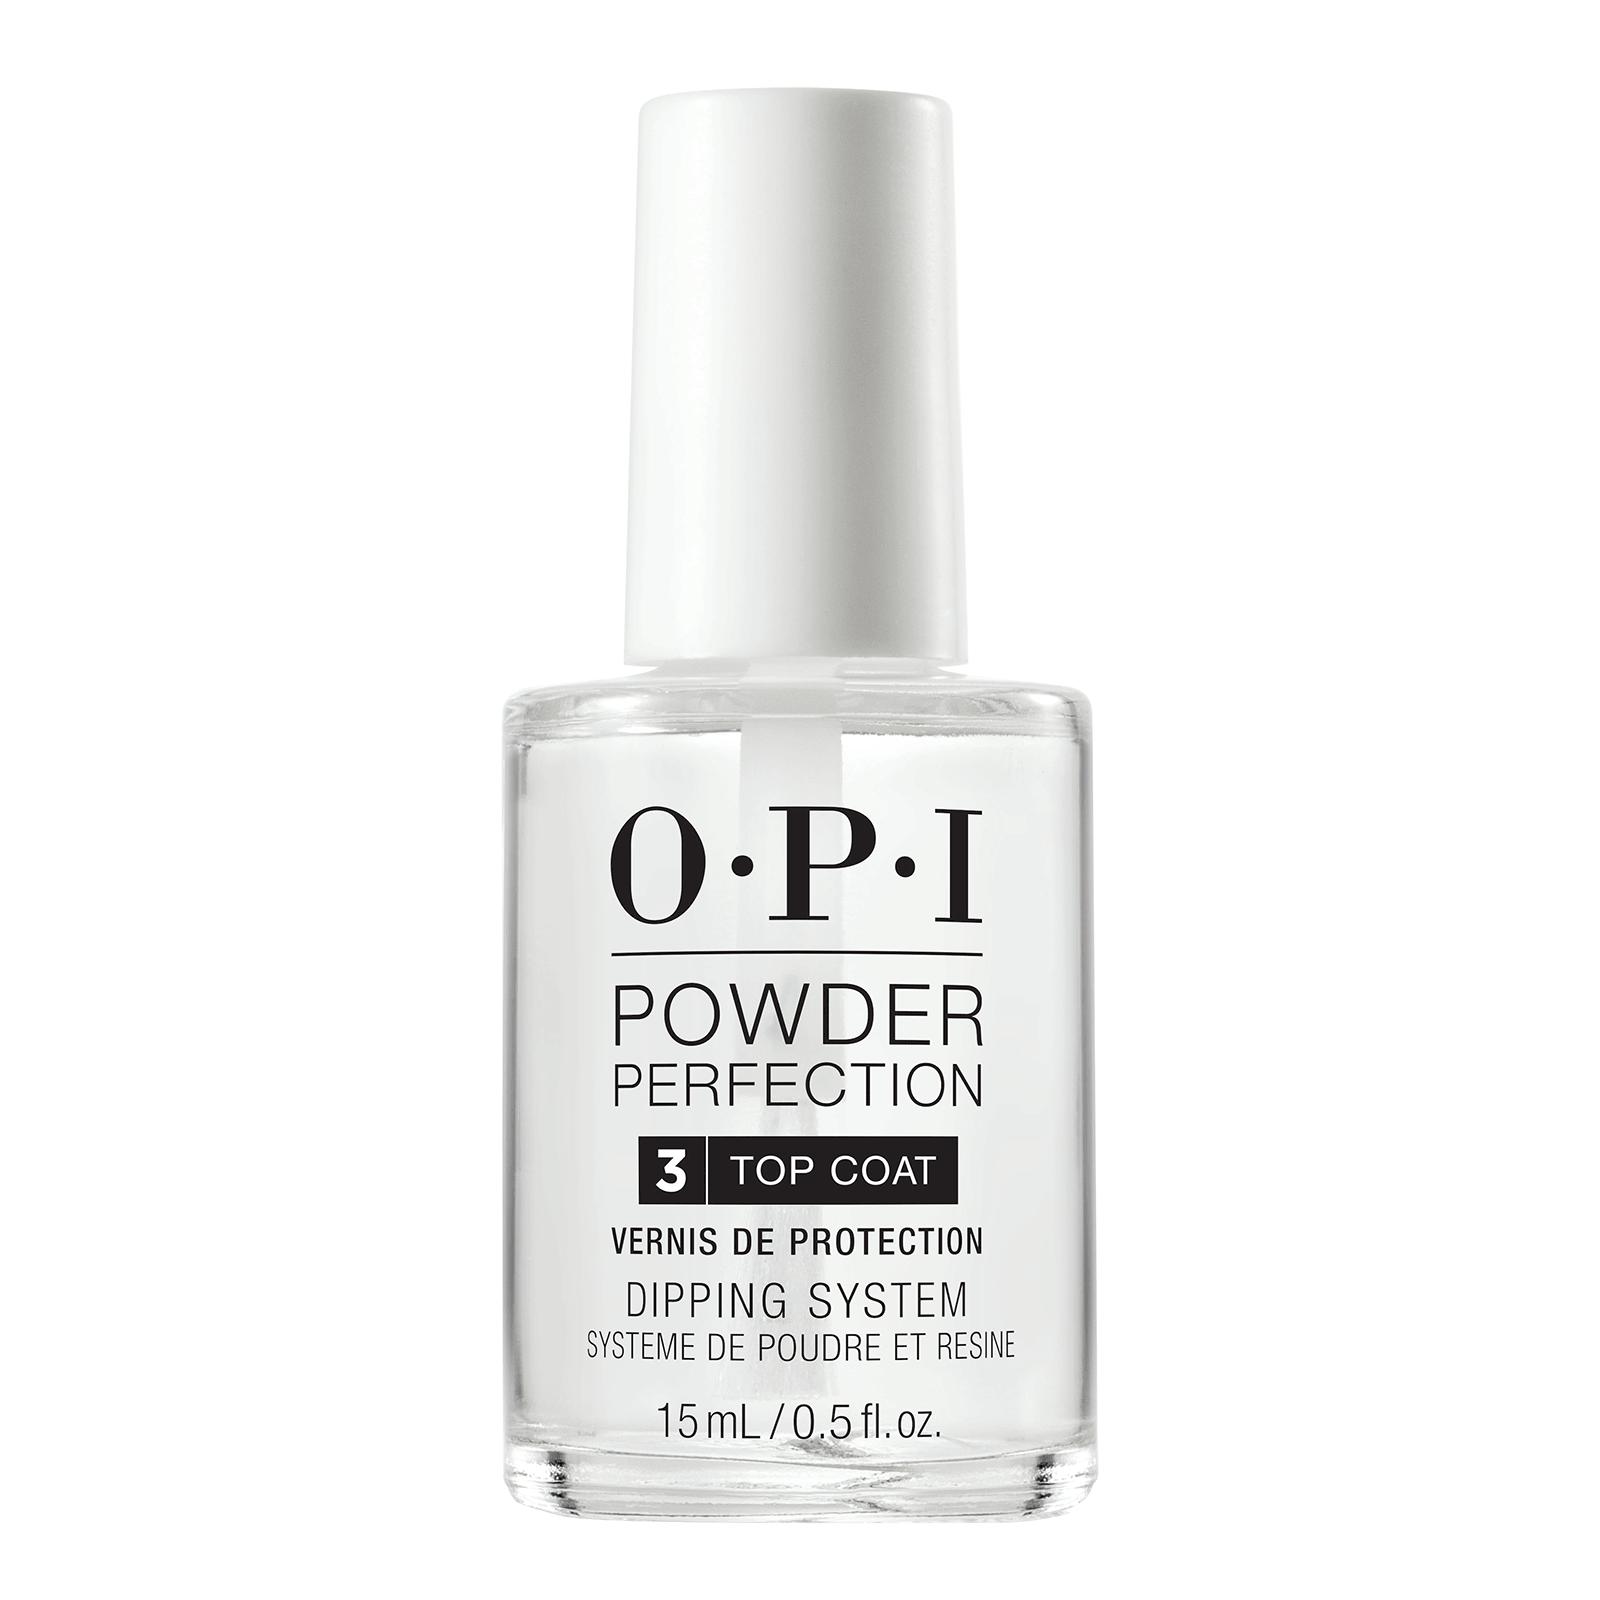 Powder Perfection Liquids Essentials Kit - OPI | CosmoProf